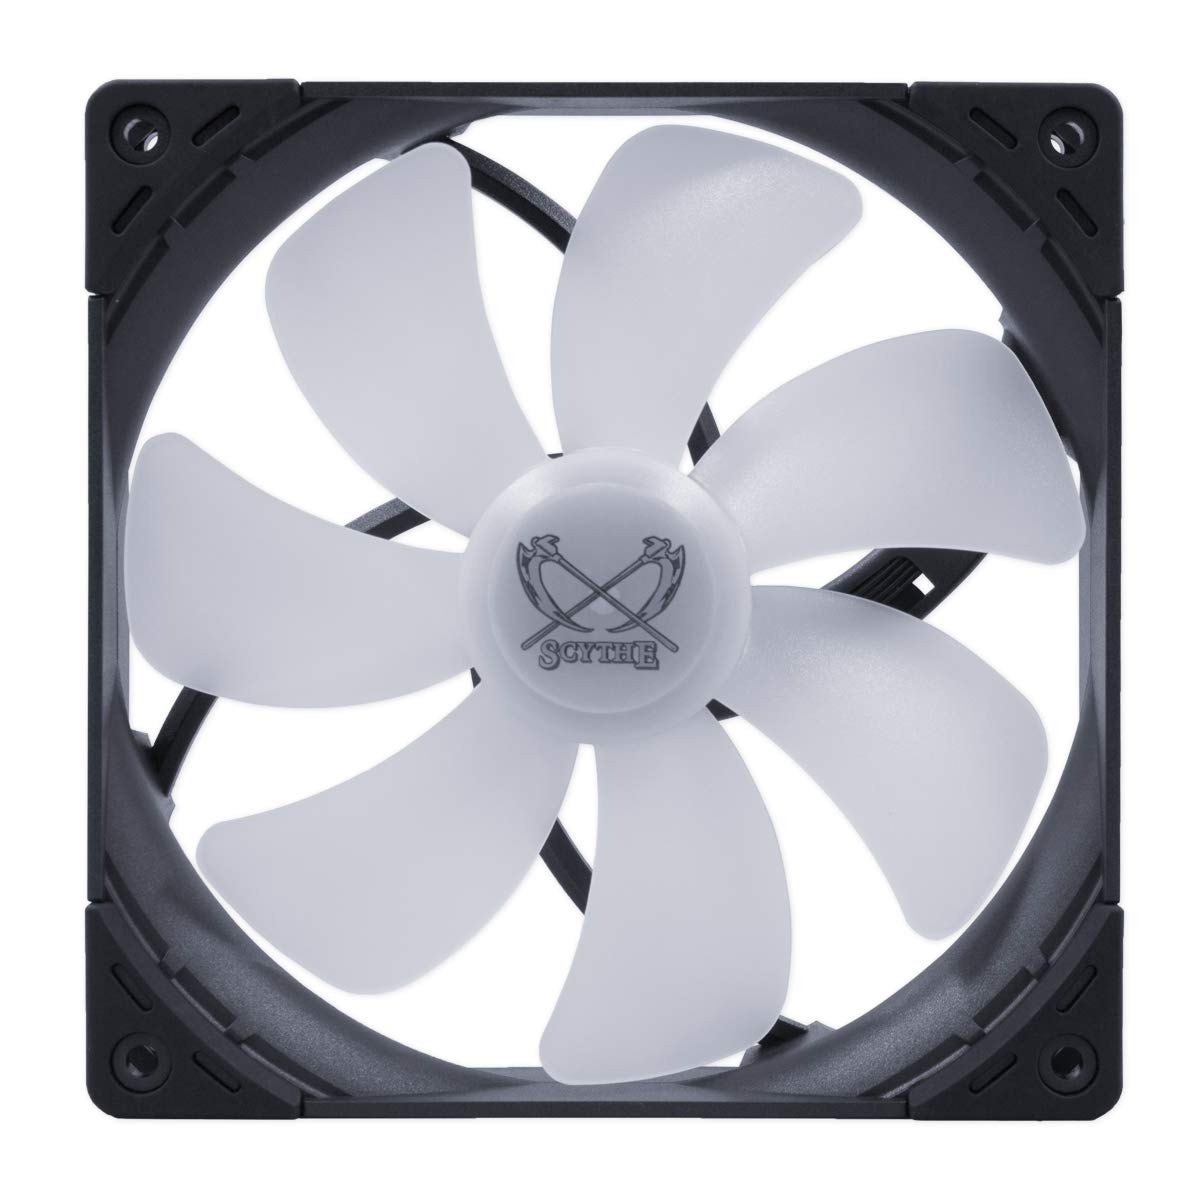 Cooler para Gabinete Scythe Kaze Flex 140 RGB, 140mm 1800 RPM, KF1425FD18SR-P